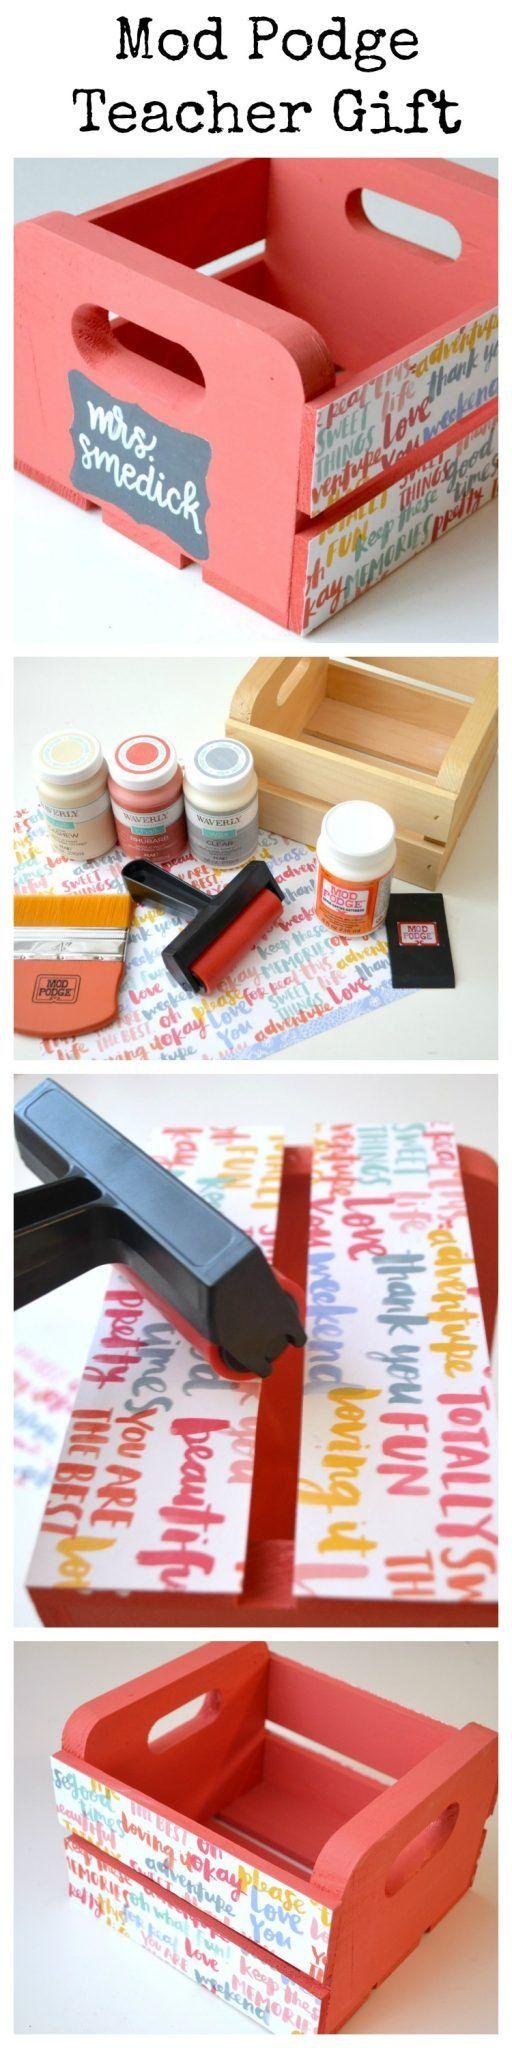 Mod Podge Teacher Gift - Storage Crate